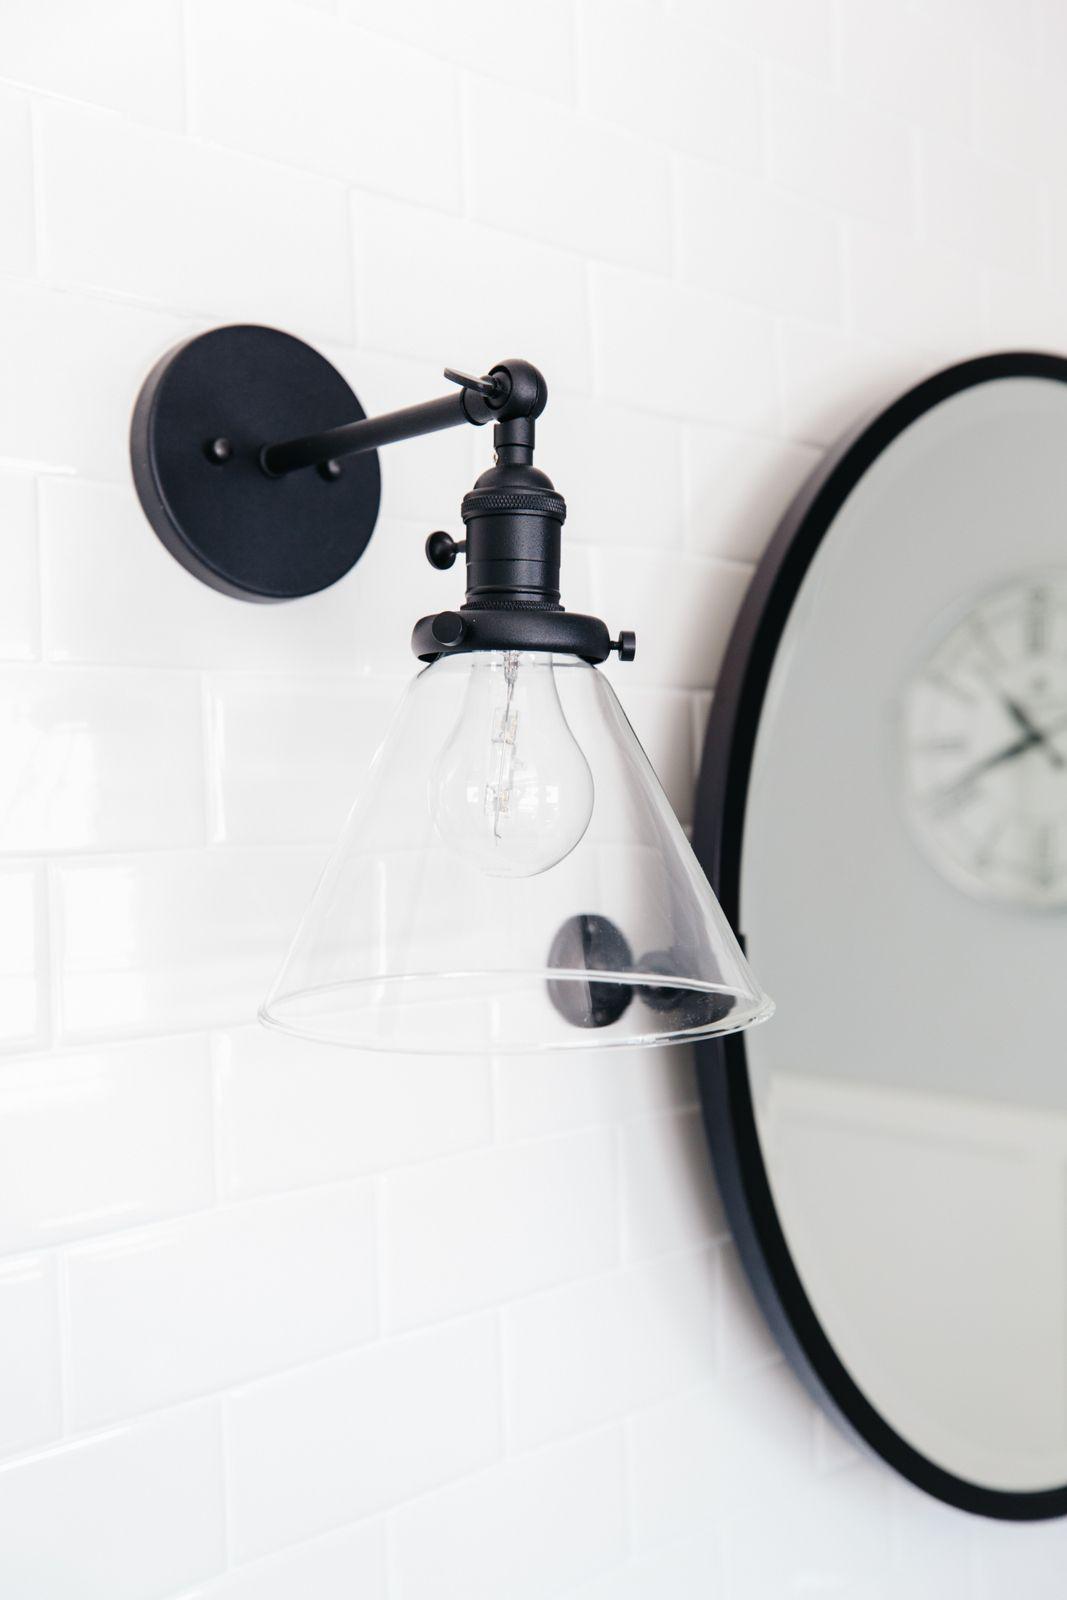 Master Bathroom Reveal Our Home Remodel The Tomkat Studio Blog Bathroom Sconces Bathroom Sconce Lighting Black Sconces